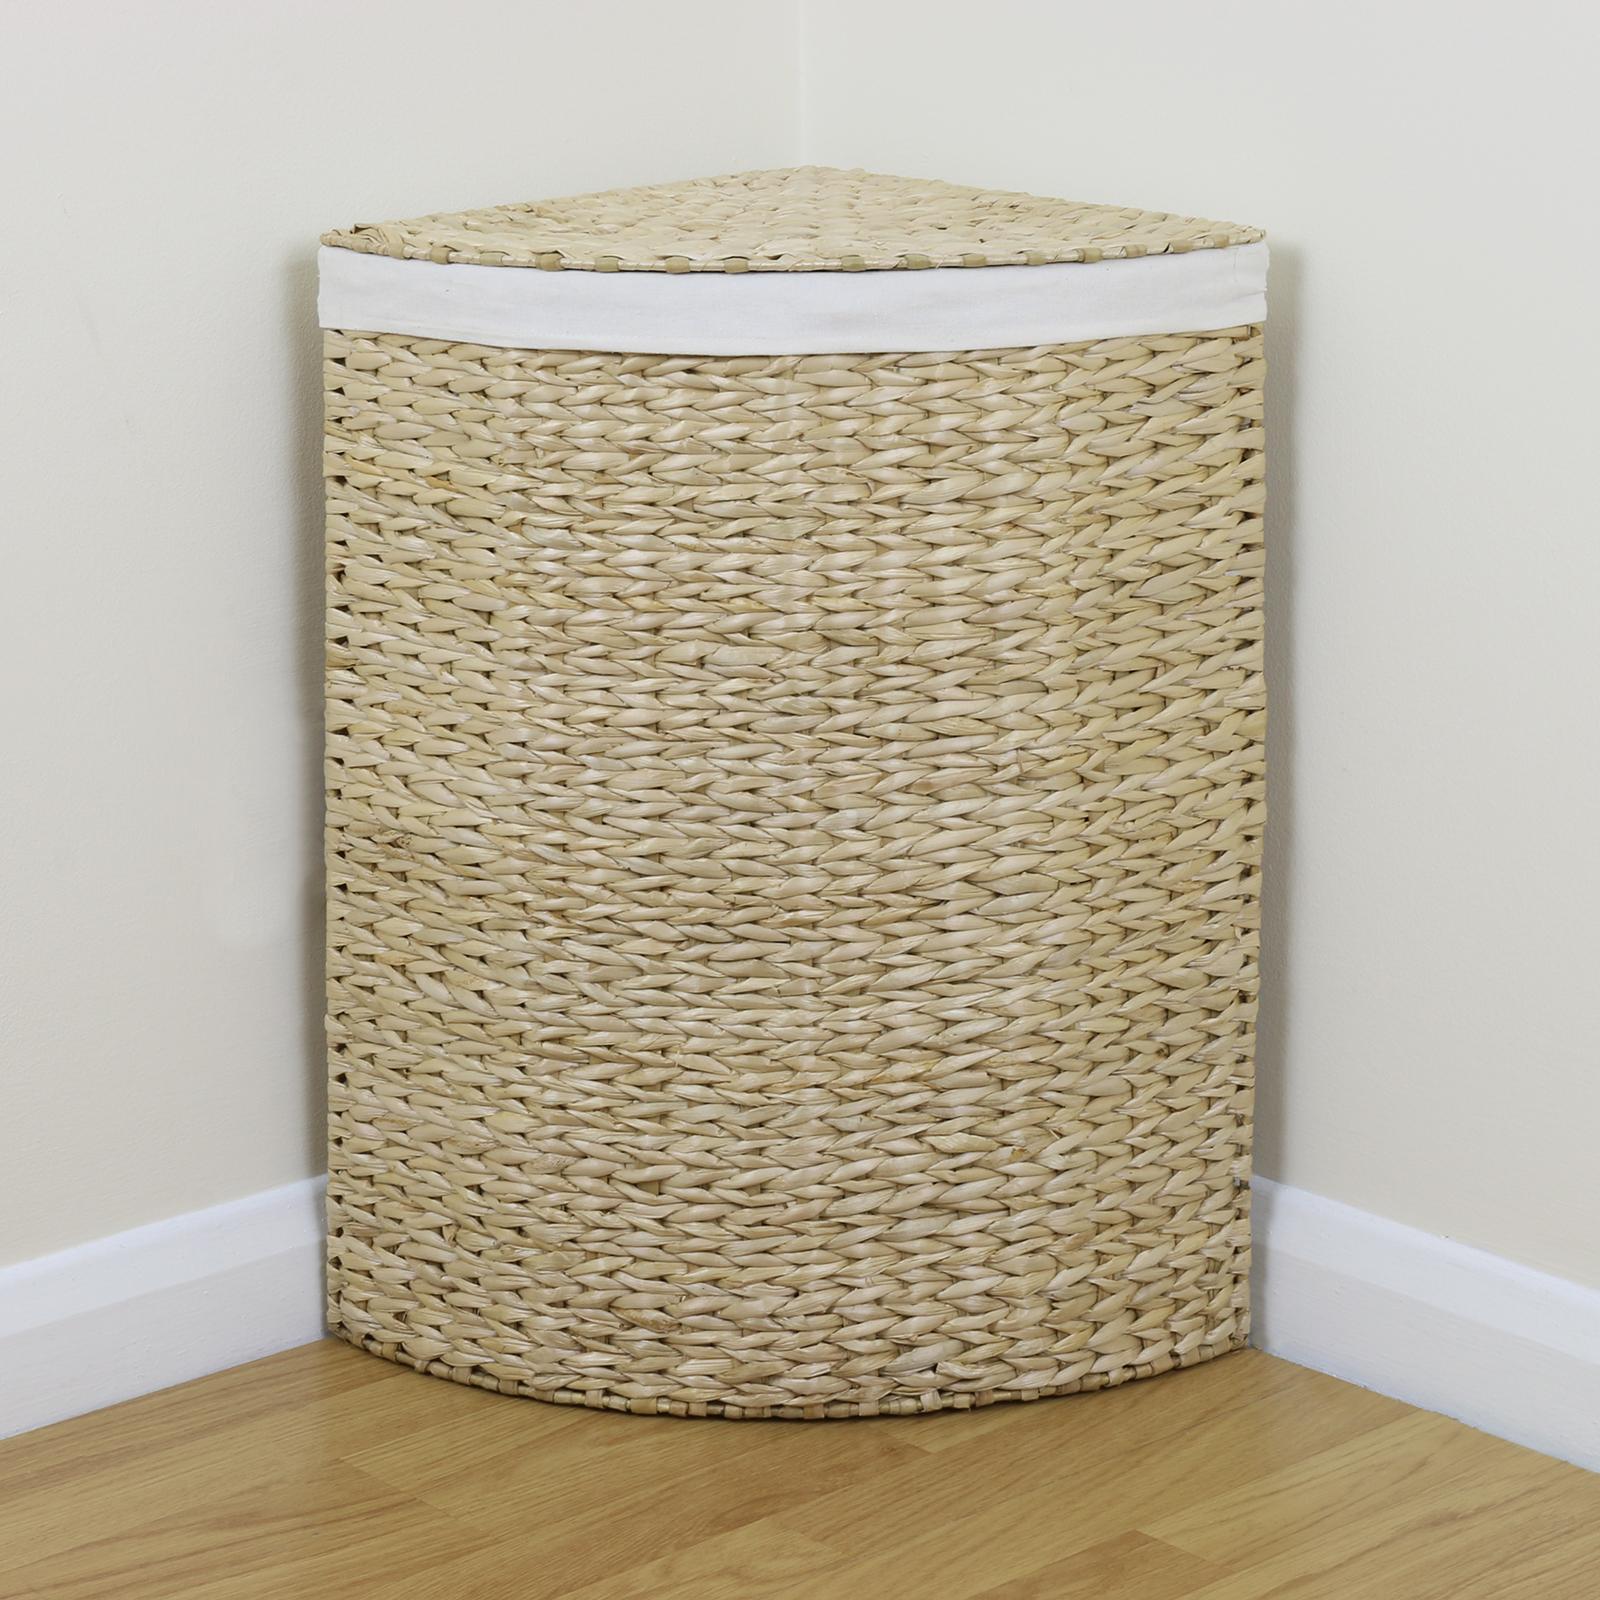 Sentinel Corner Woven Laundry Basket Cloth Lining Lid Hamper Bin Wicker Washing Storage